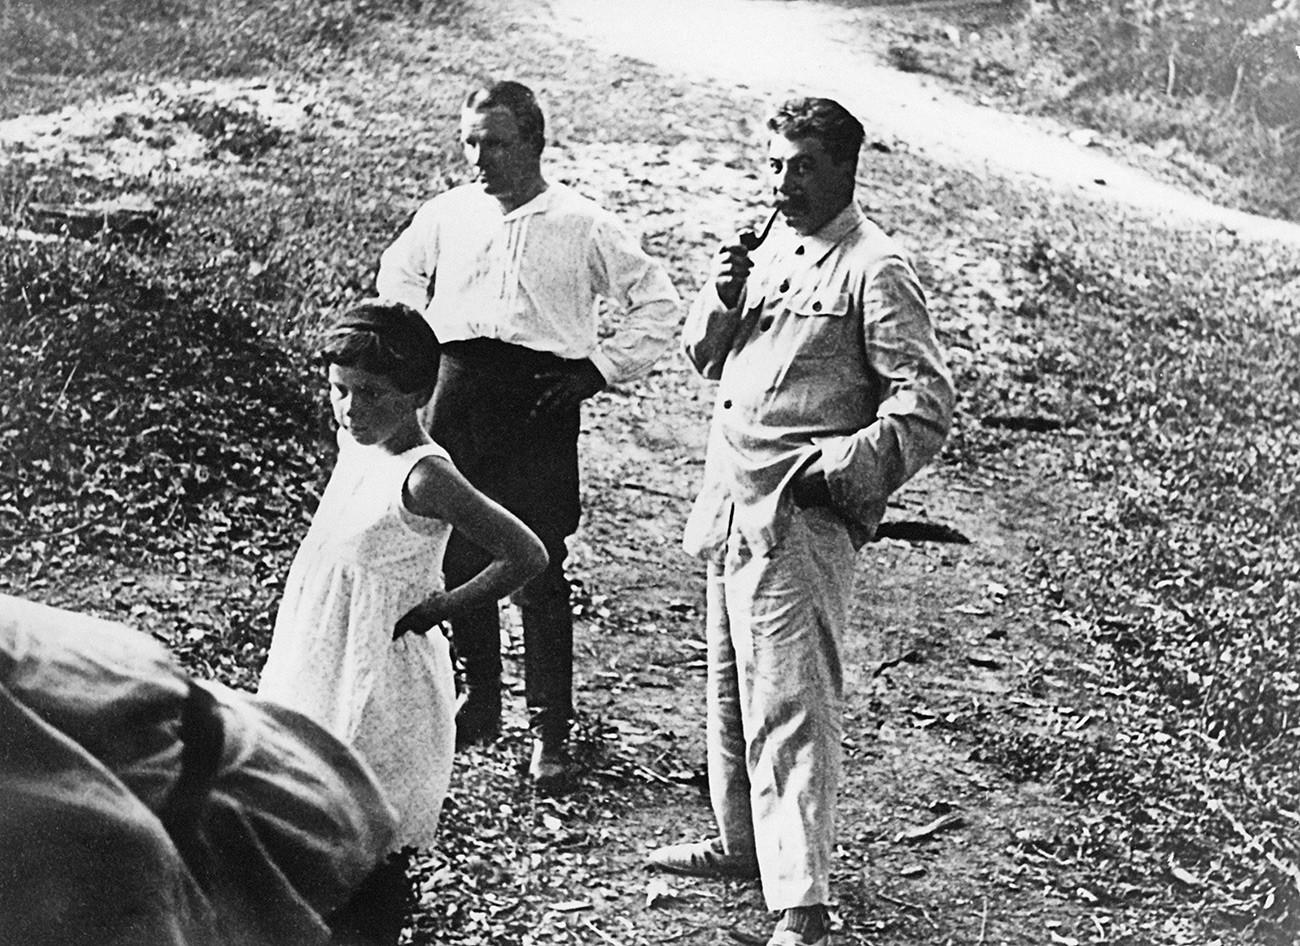 Staline, sa fille Svetlana et Sergueï Kirov dans les années 30